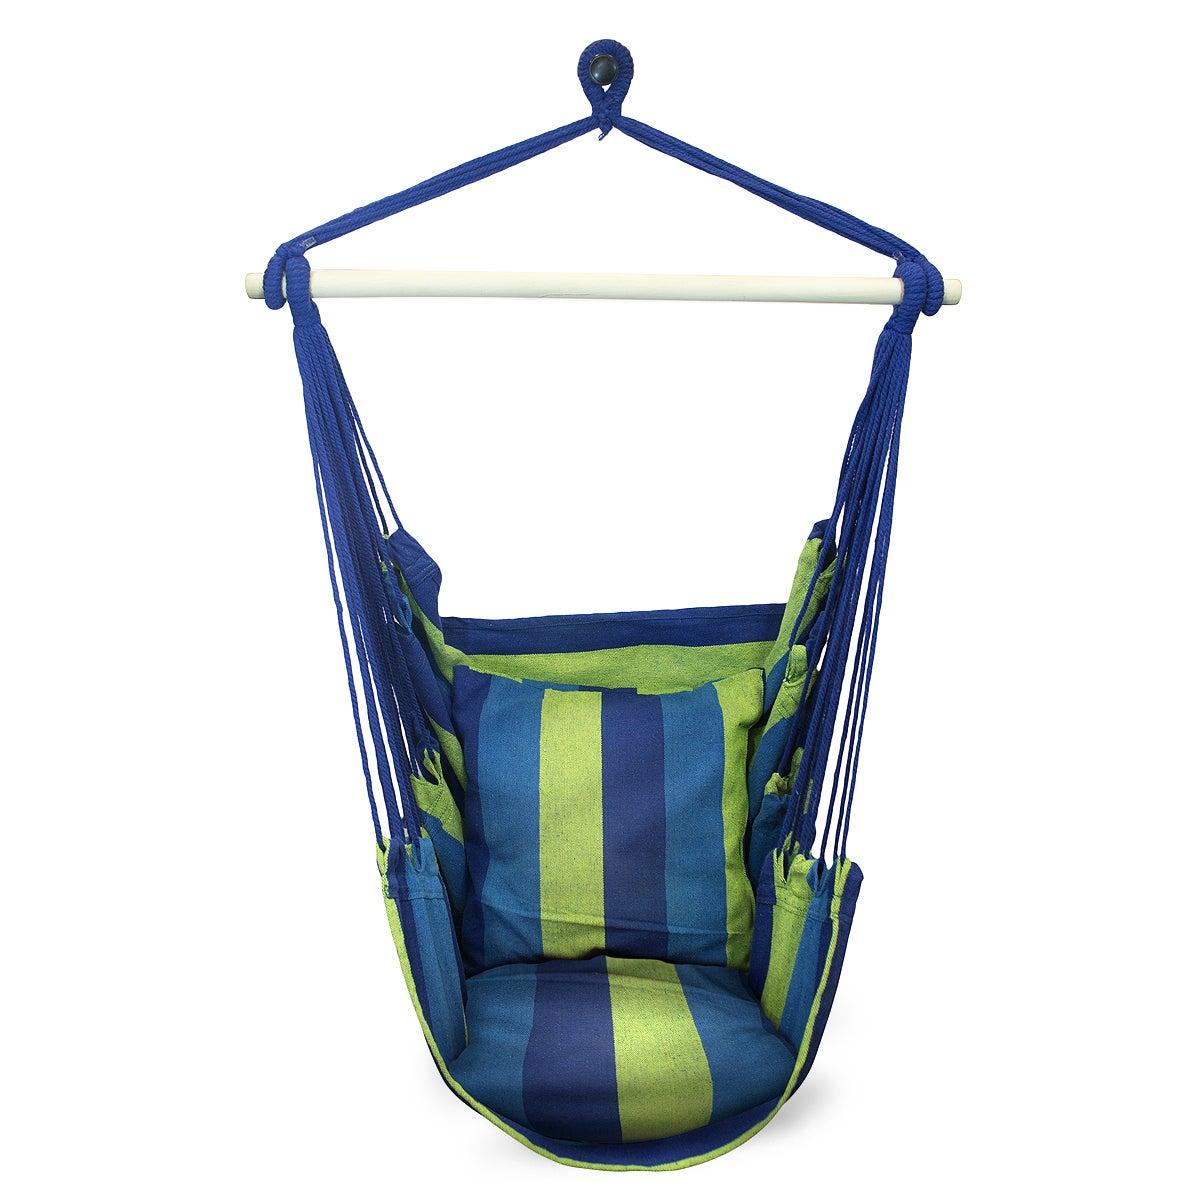 Sorbus Blue Hanging Rope Hammock Chair Swing Seat  sc 1 st  Overstock.com & Buy Hammocks u0026 Porch Swings Online at Overstock | Our Best Patio ...